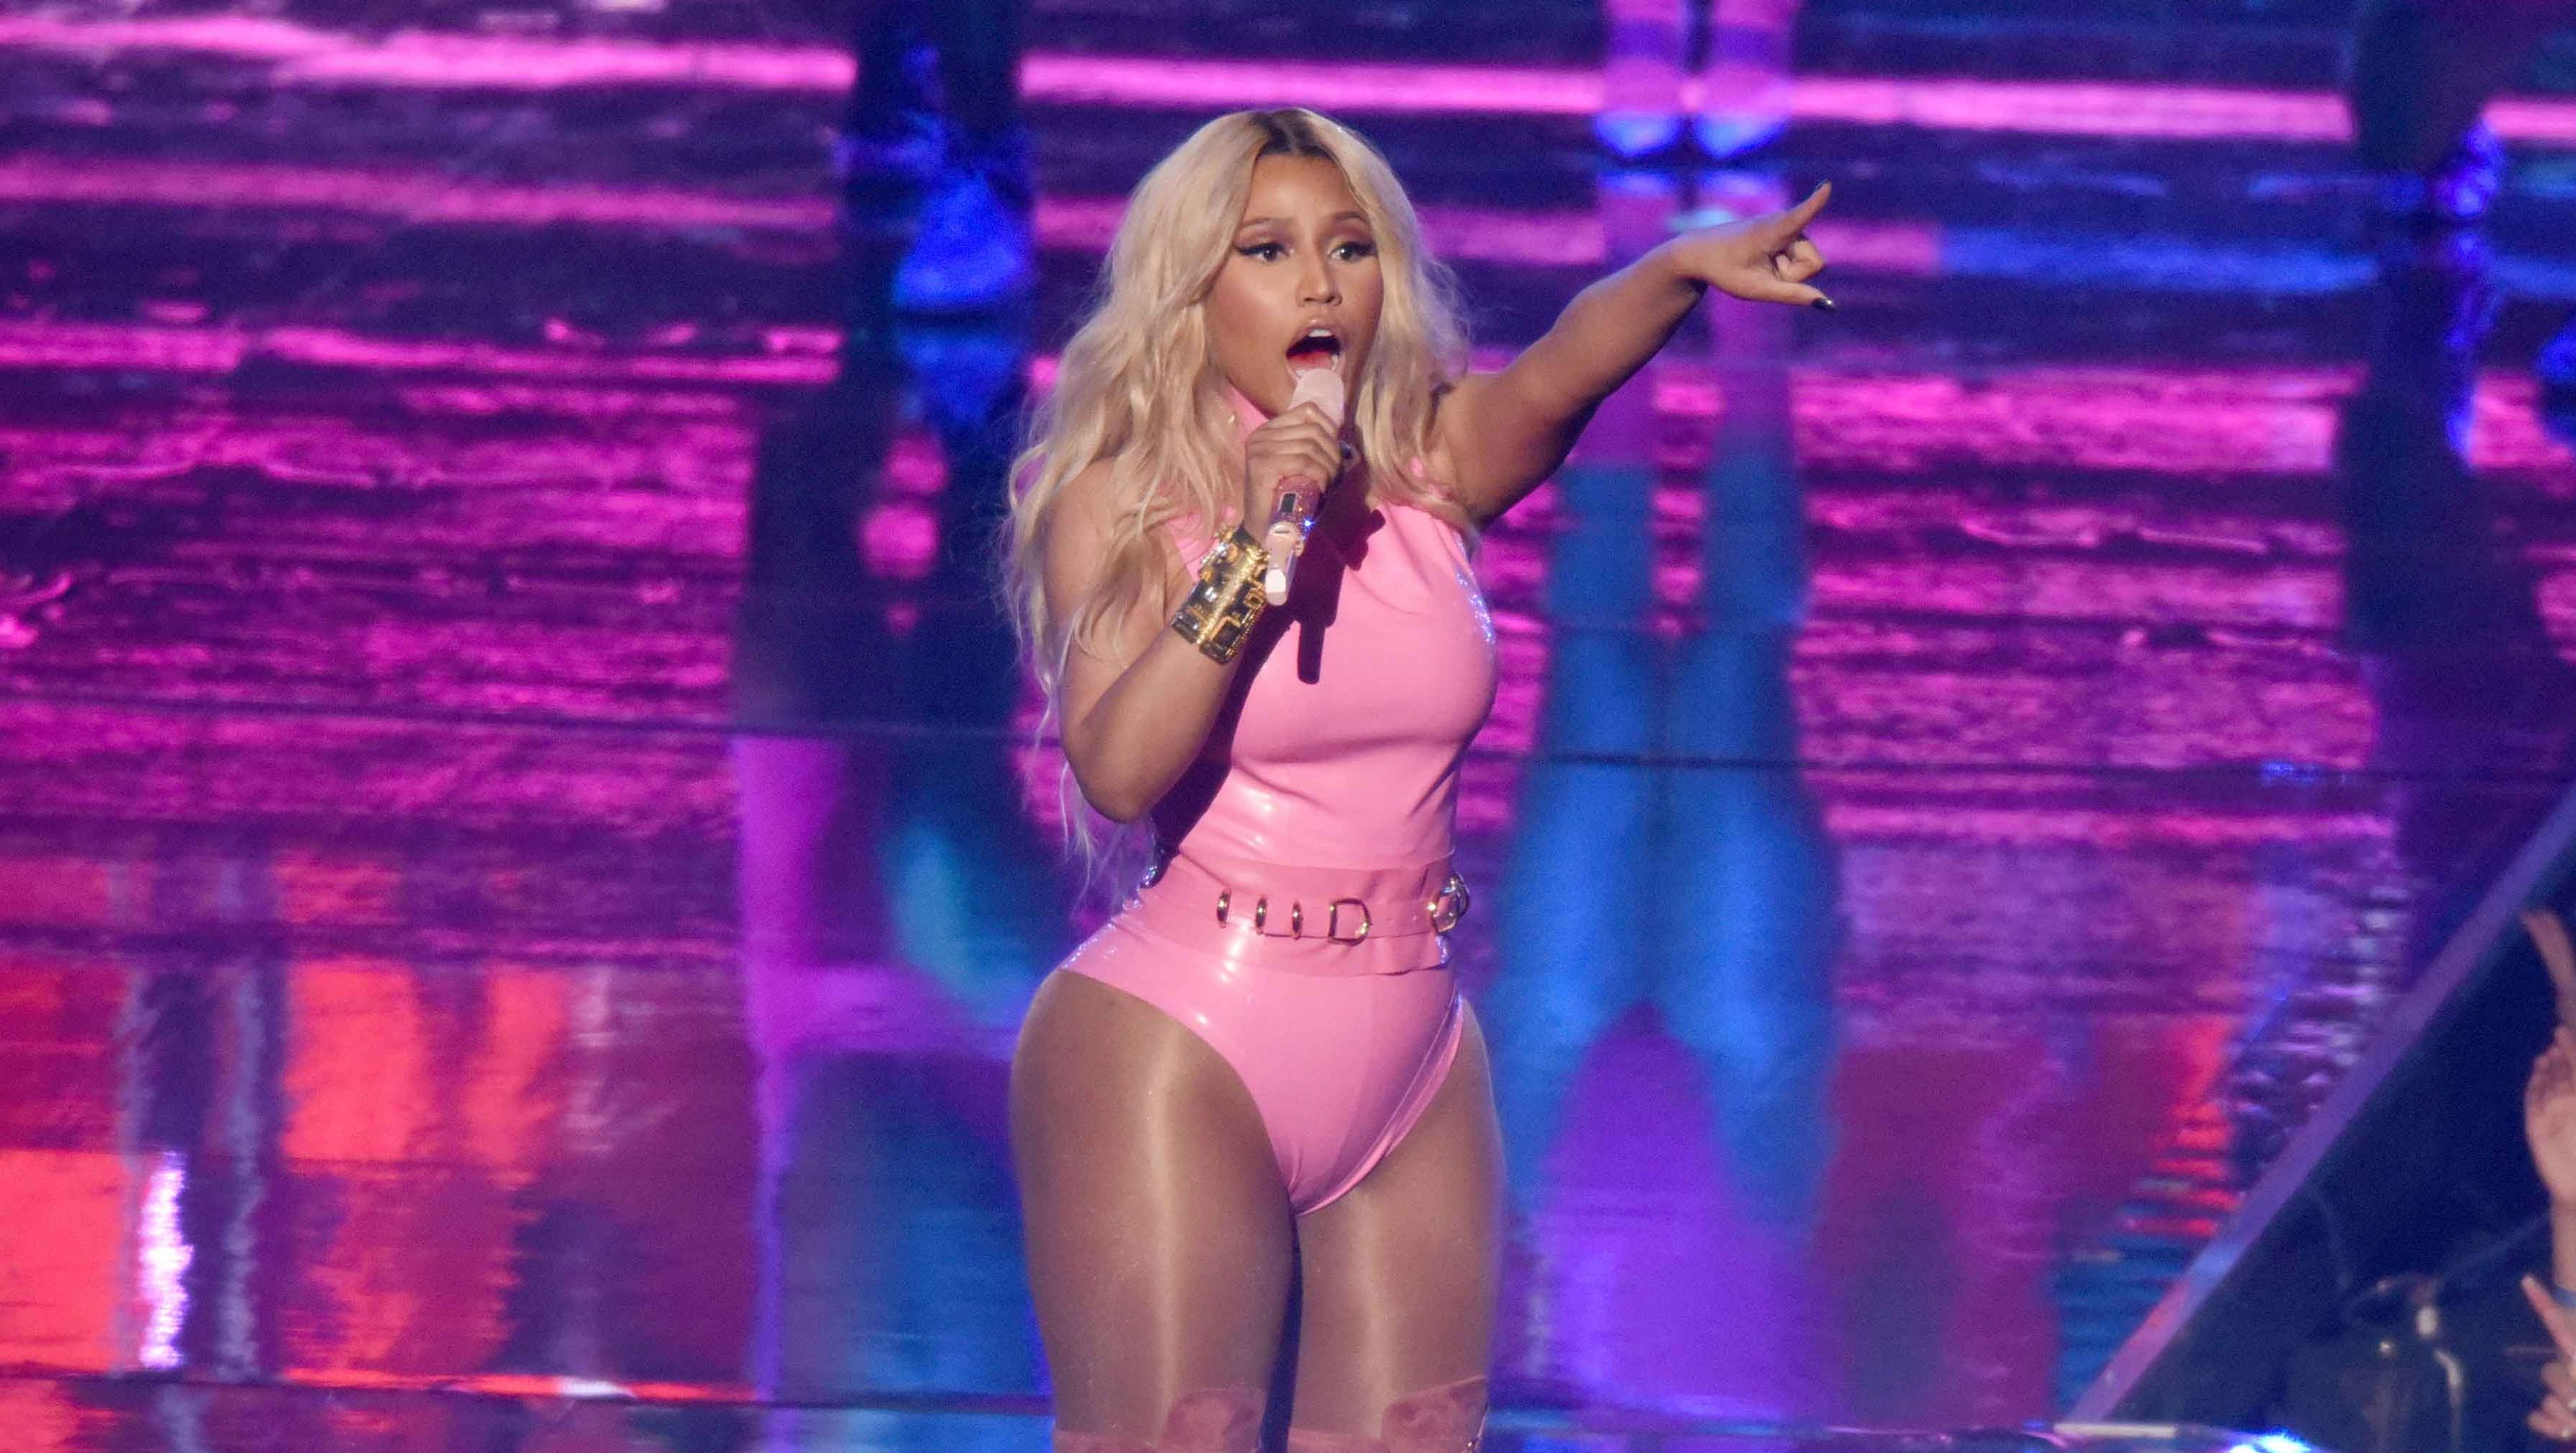 Nicki Minaj to Reshoot Music Video Filmed on Westminster Bridge Day Before London Attack